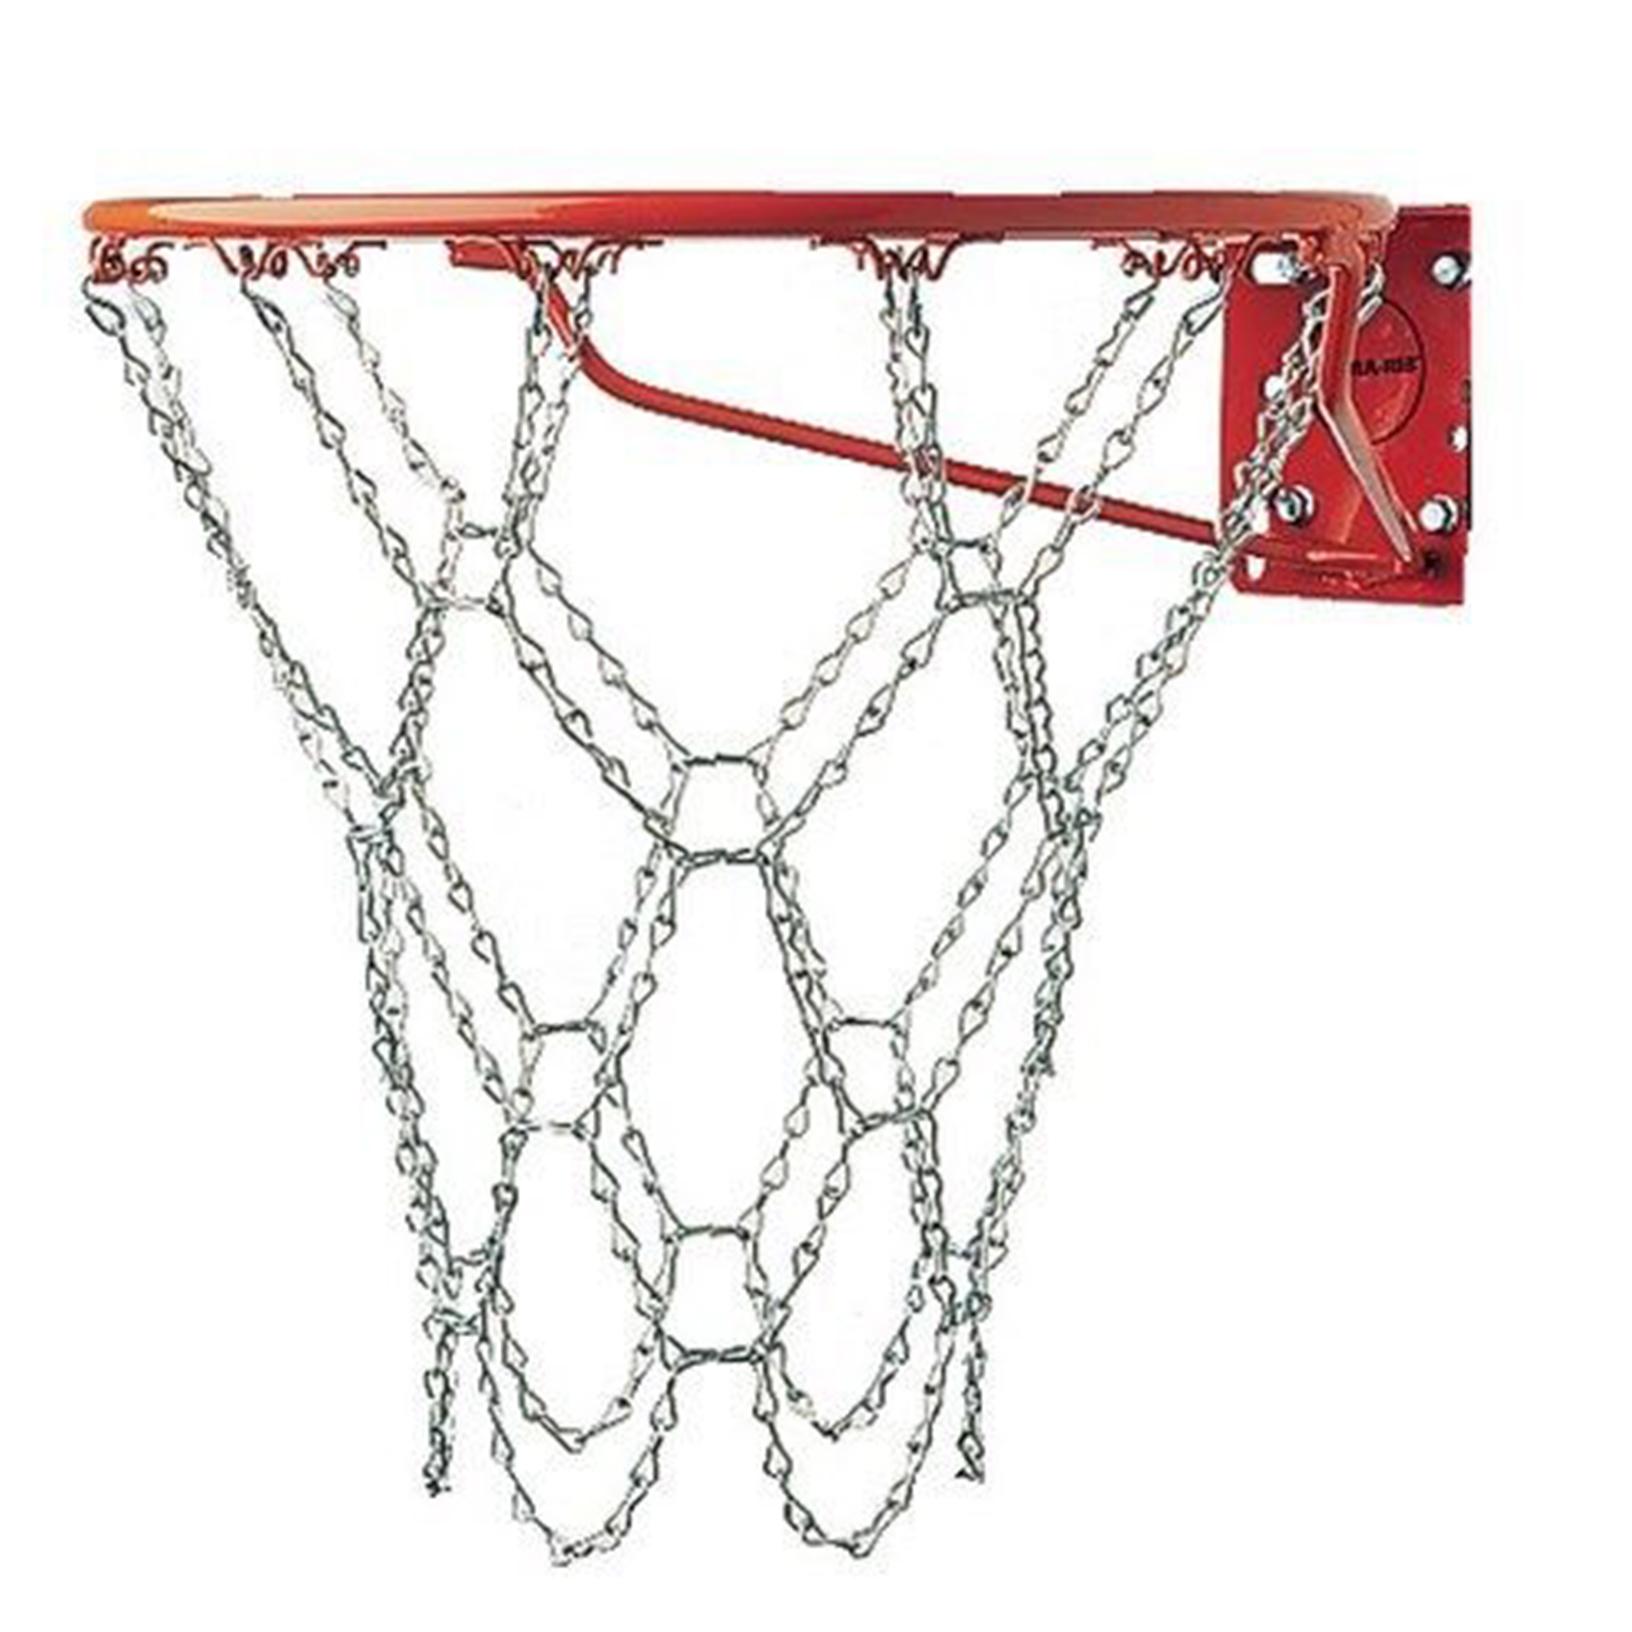 1632x1632 Olympia Sports Steel Chain Basketball Nets